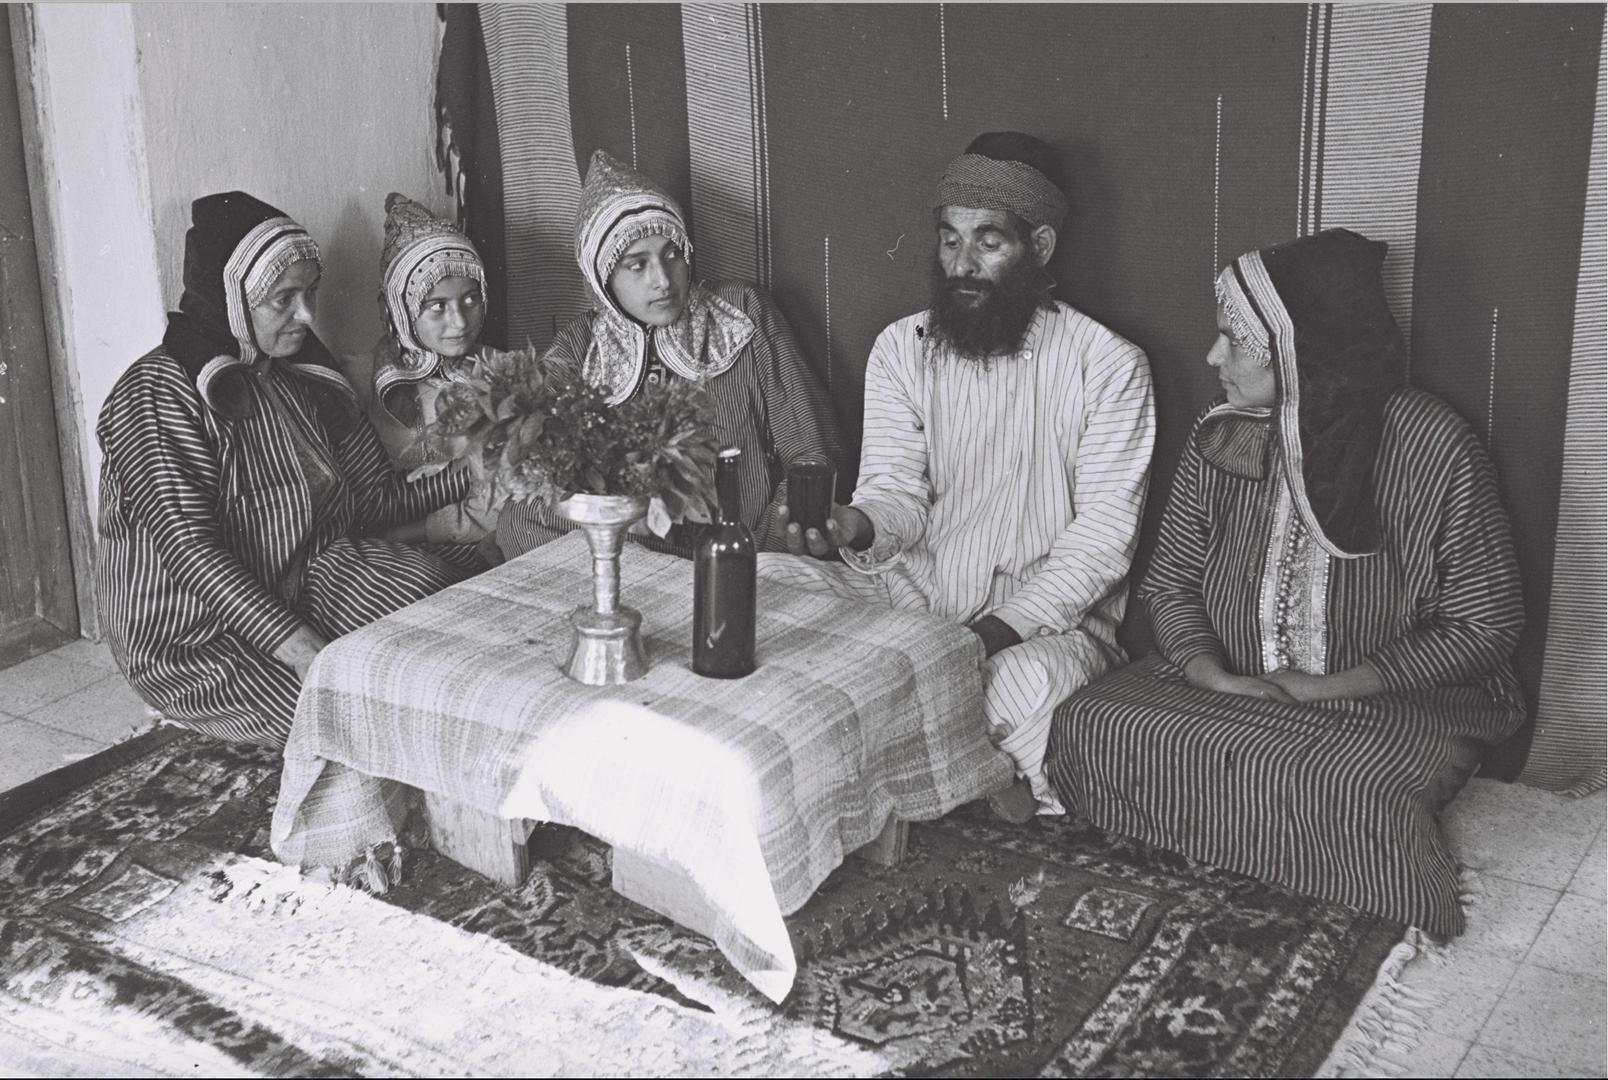 Mizrahi Heritage Month